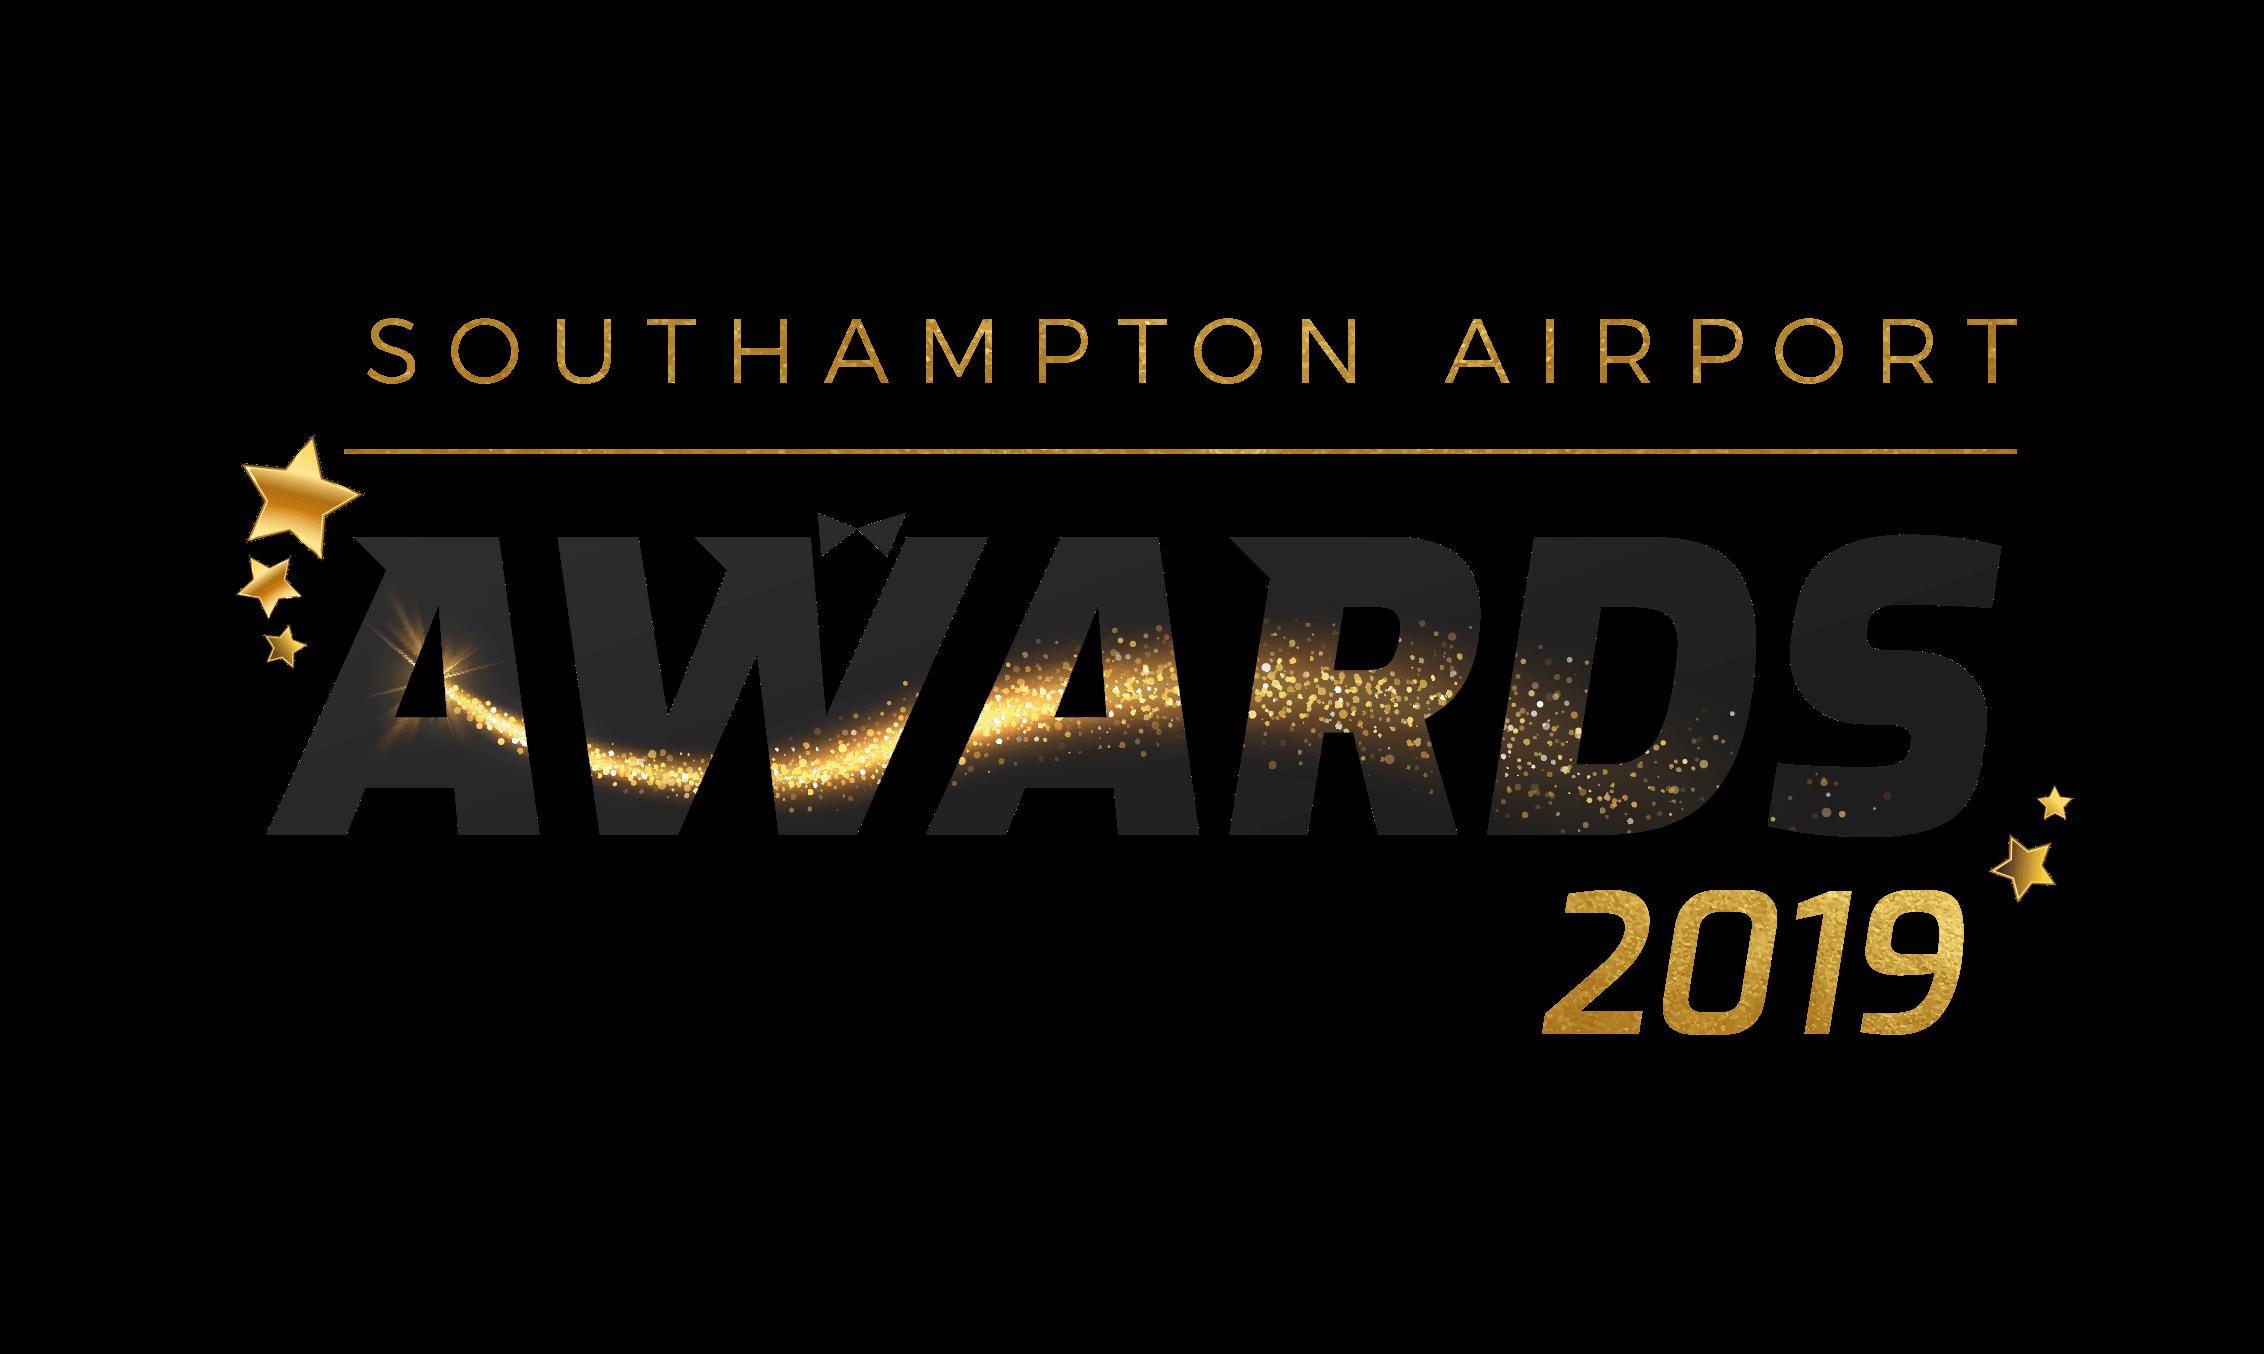 James_Bond_Awards_Logo2